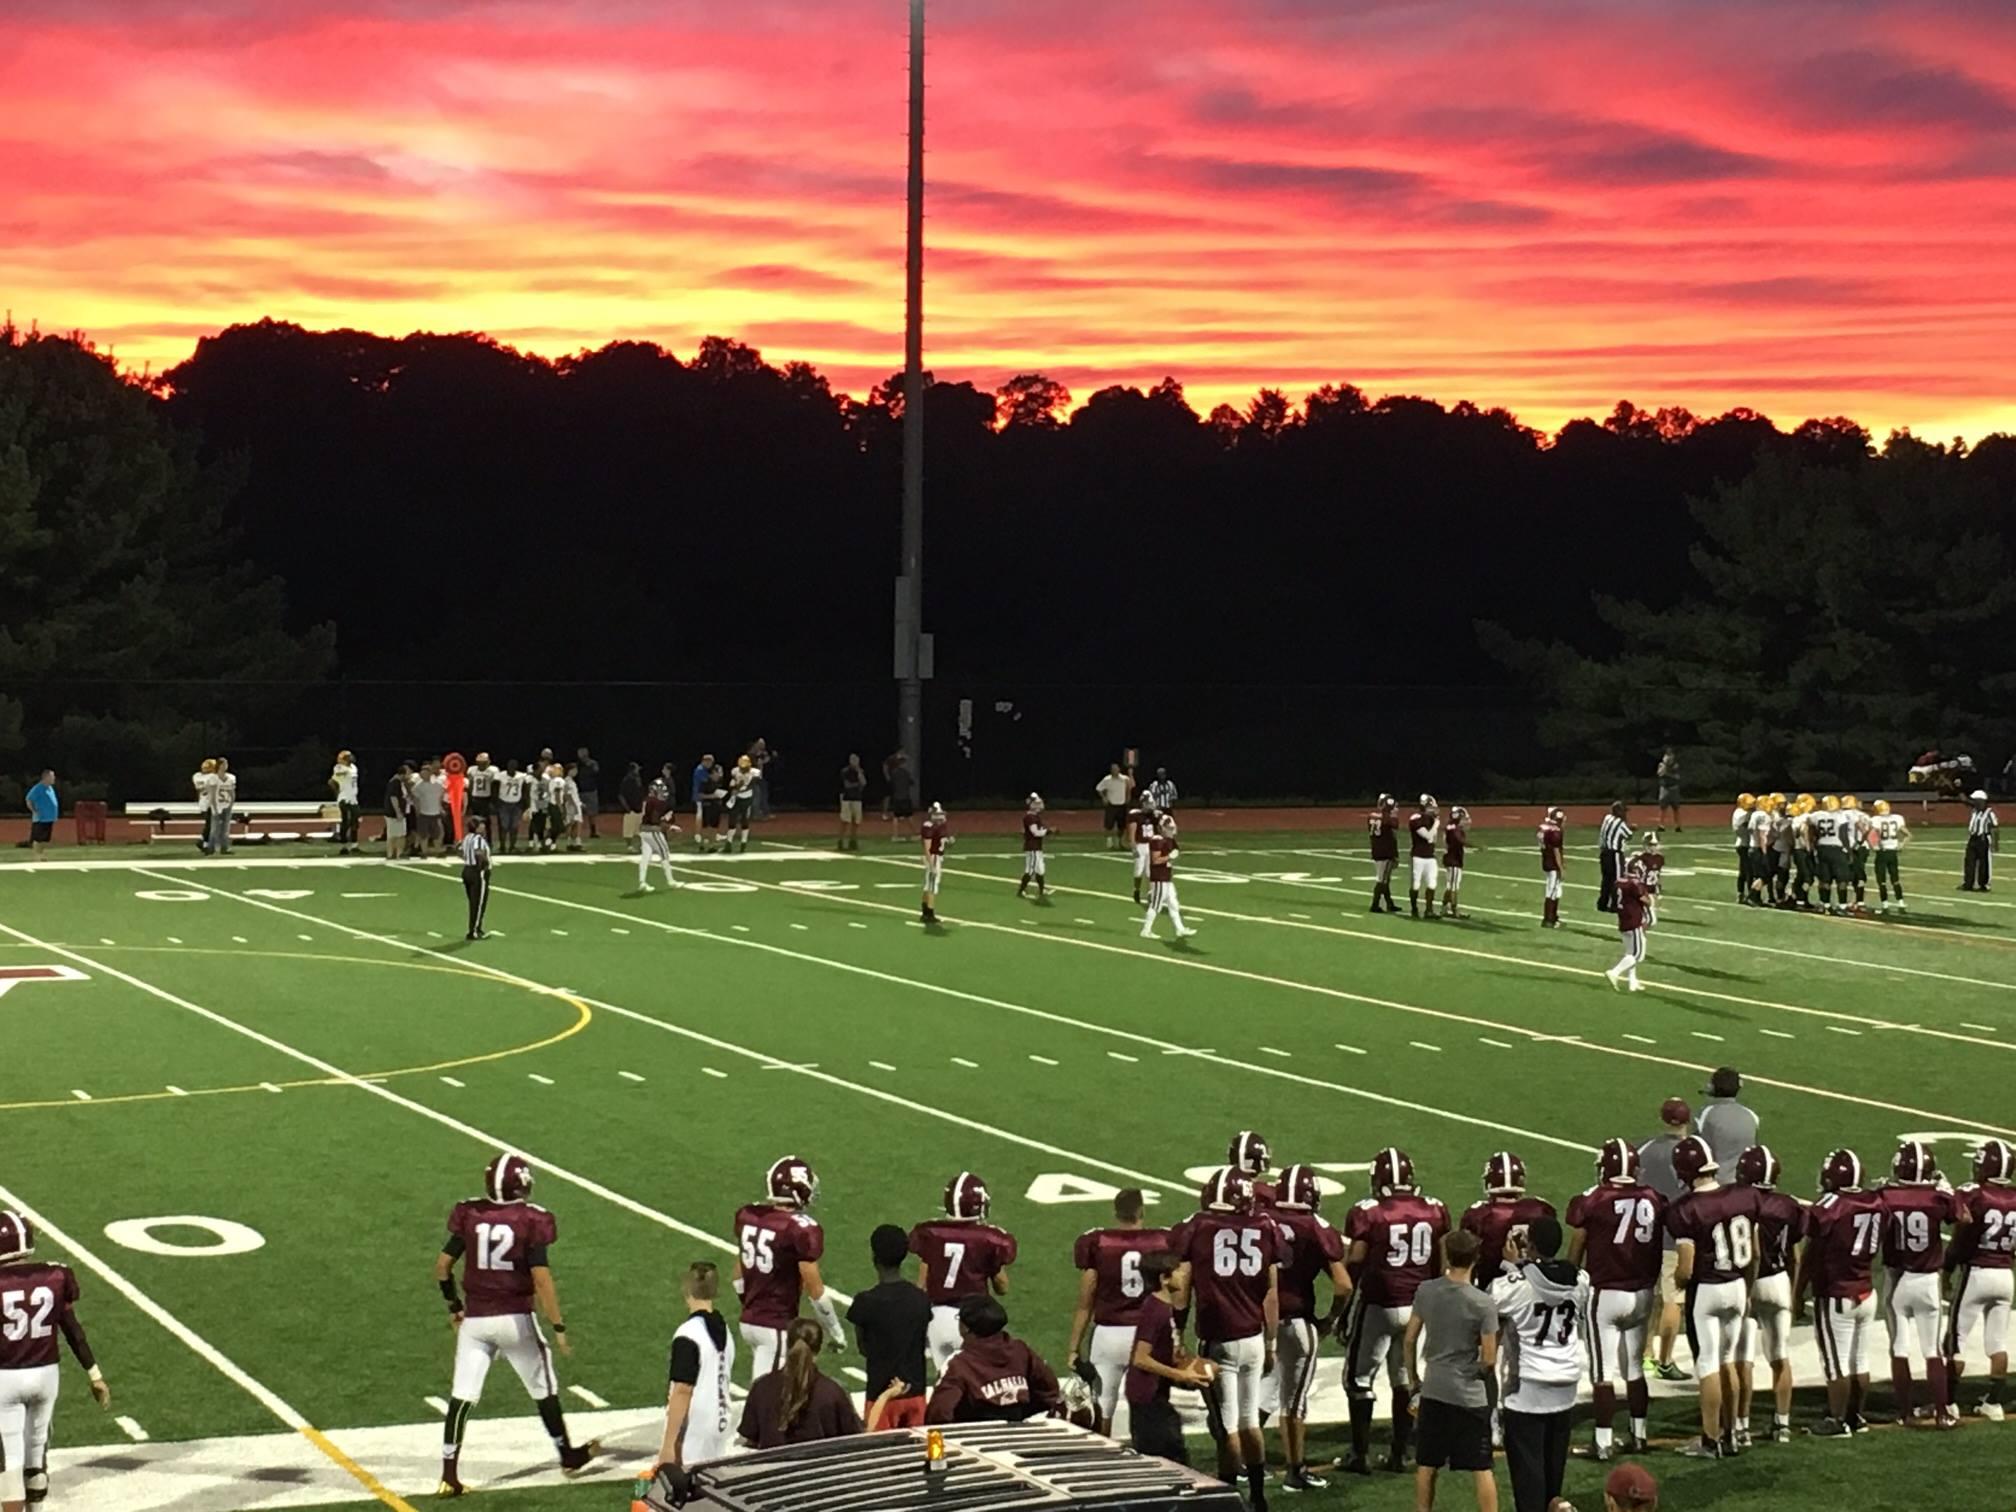 football field at sunset